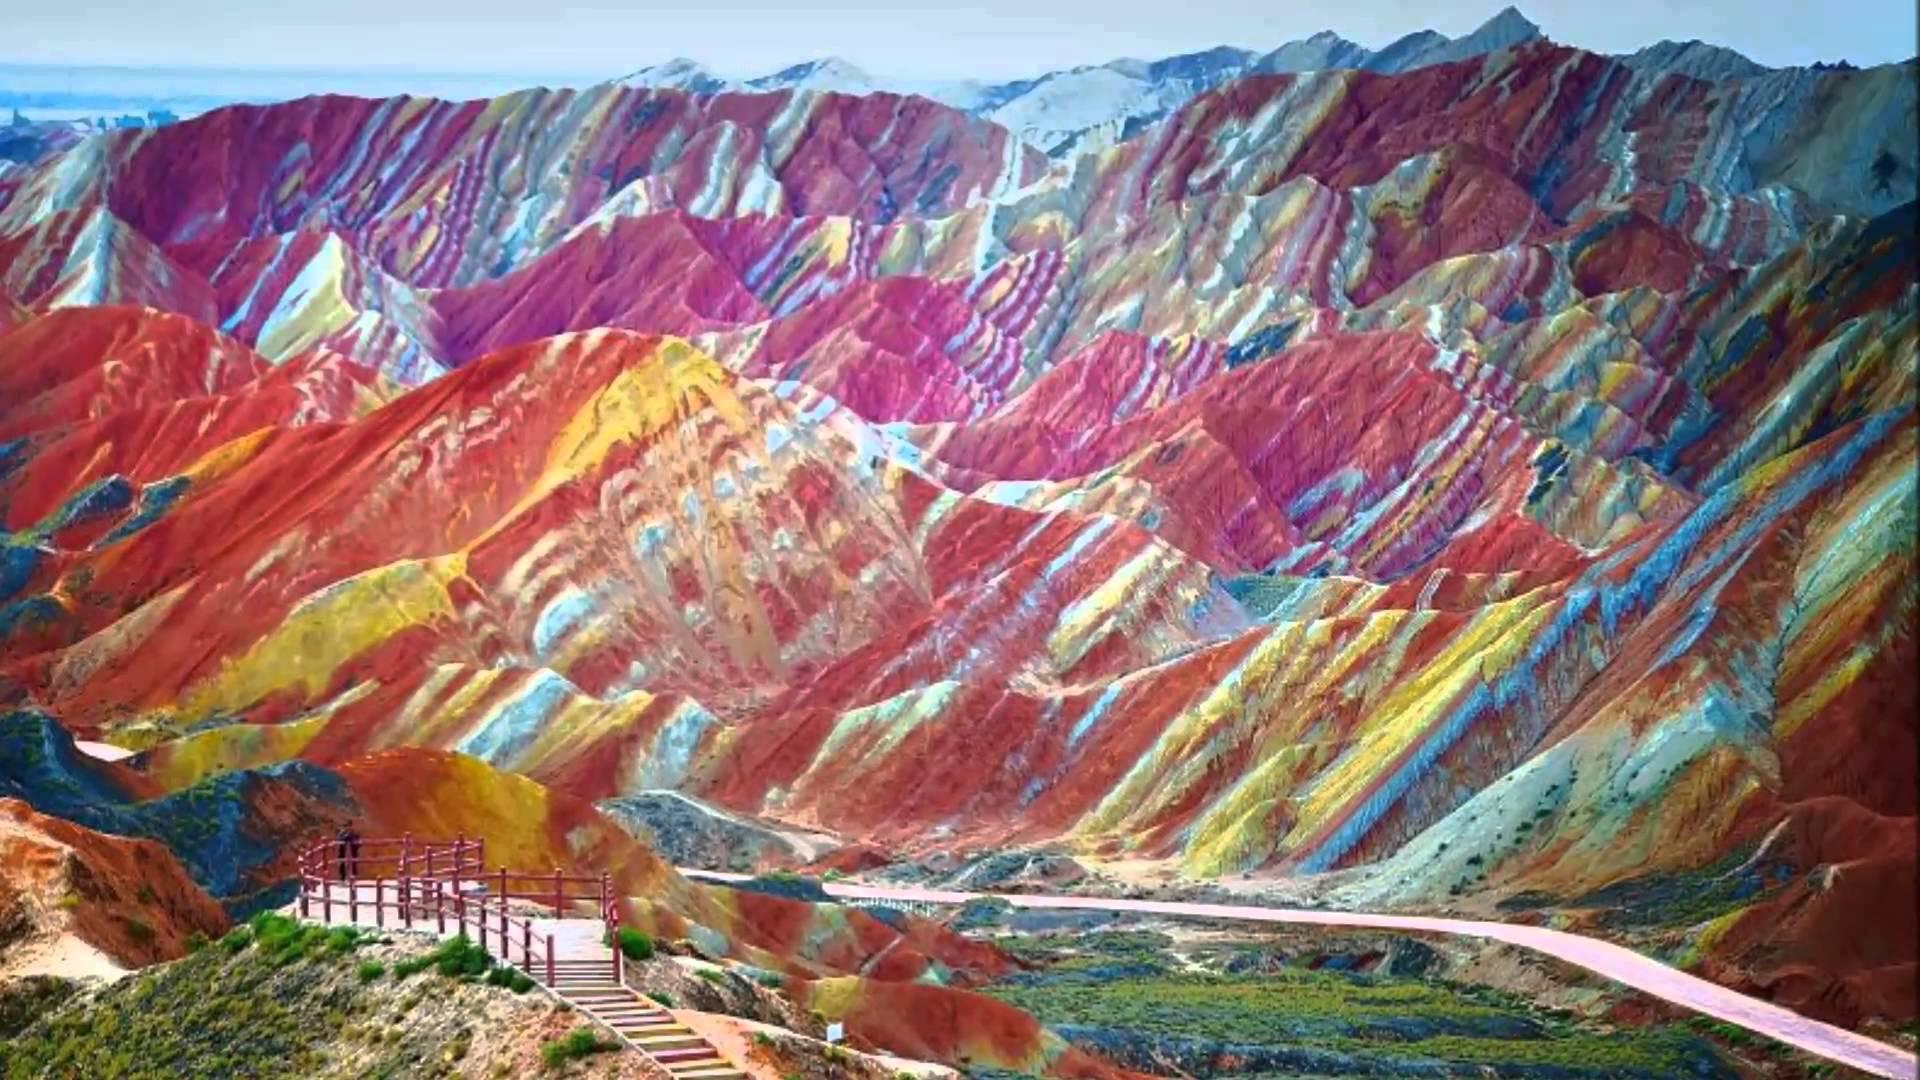 World Rainbow mountains - Wanderlust Magazine